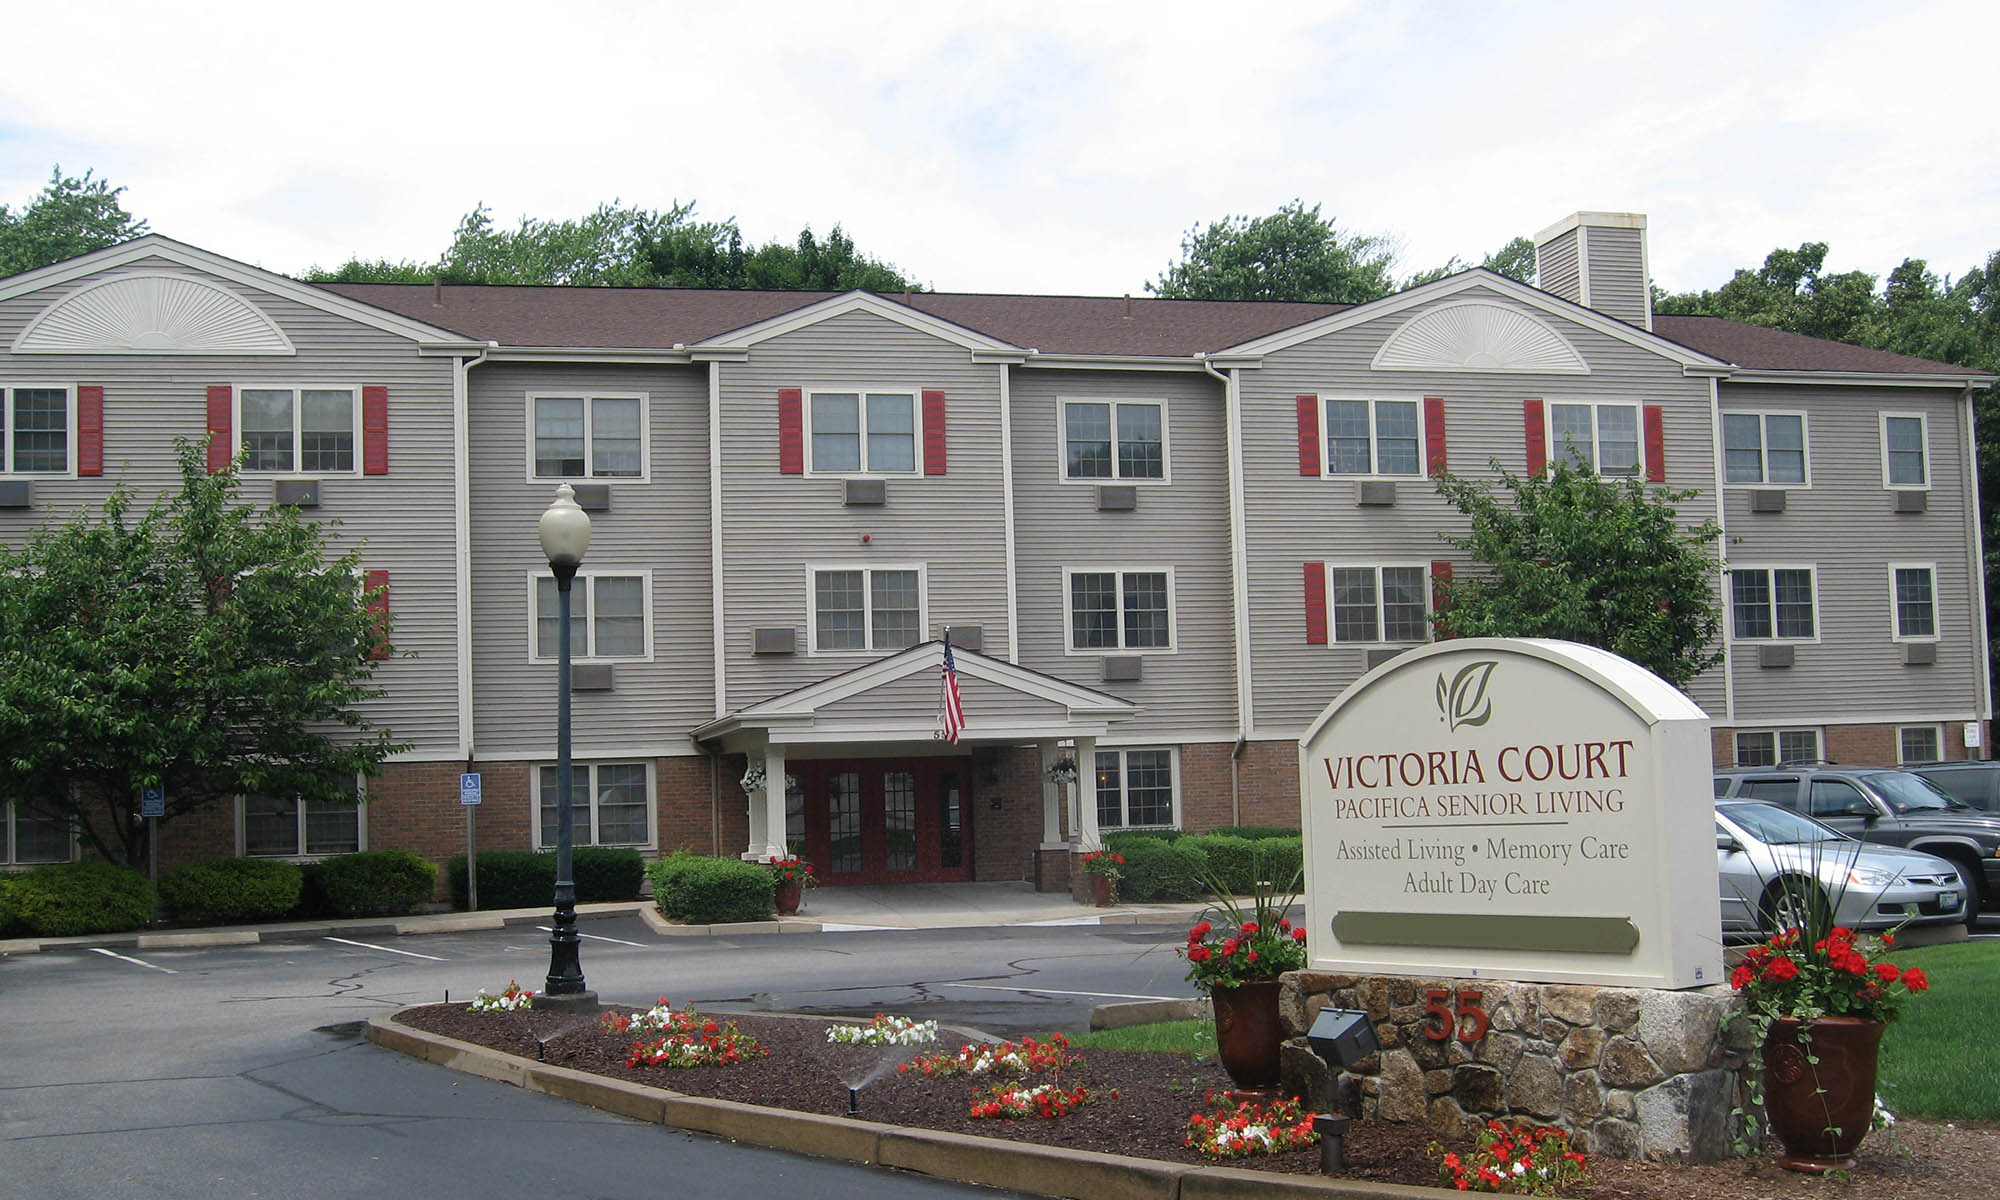 Exterior view of Pacifica Senior Living Victoria Court